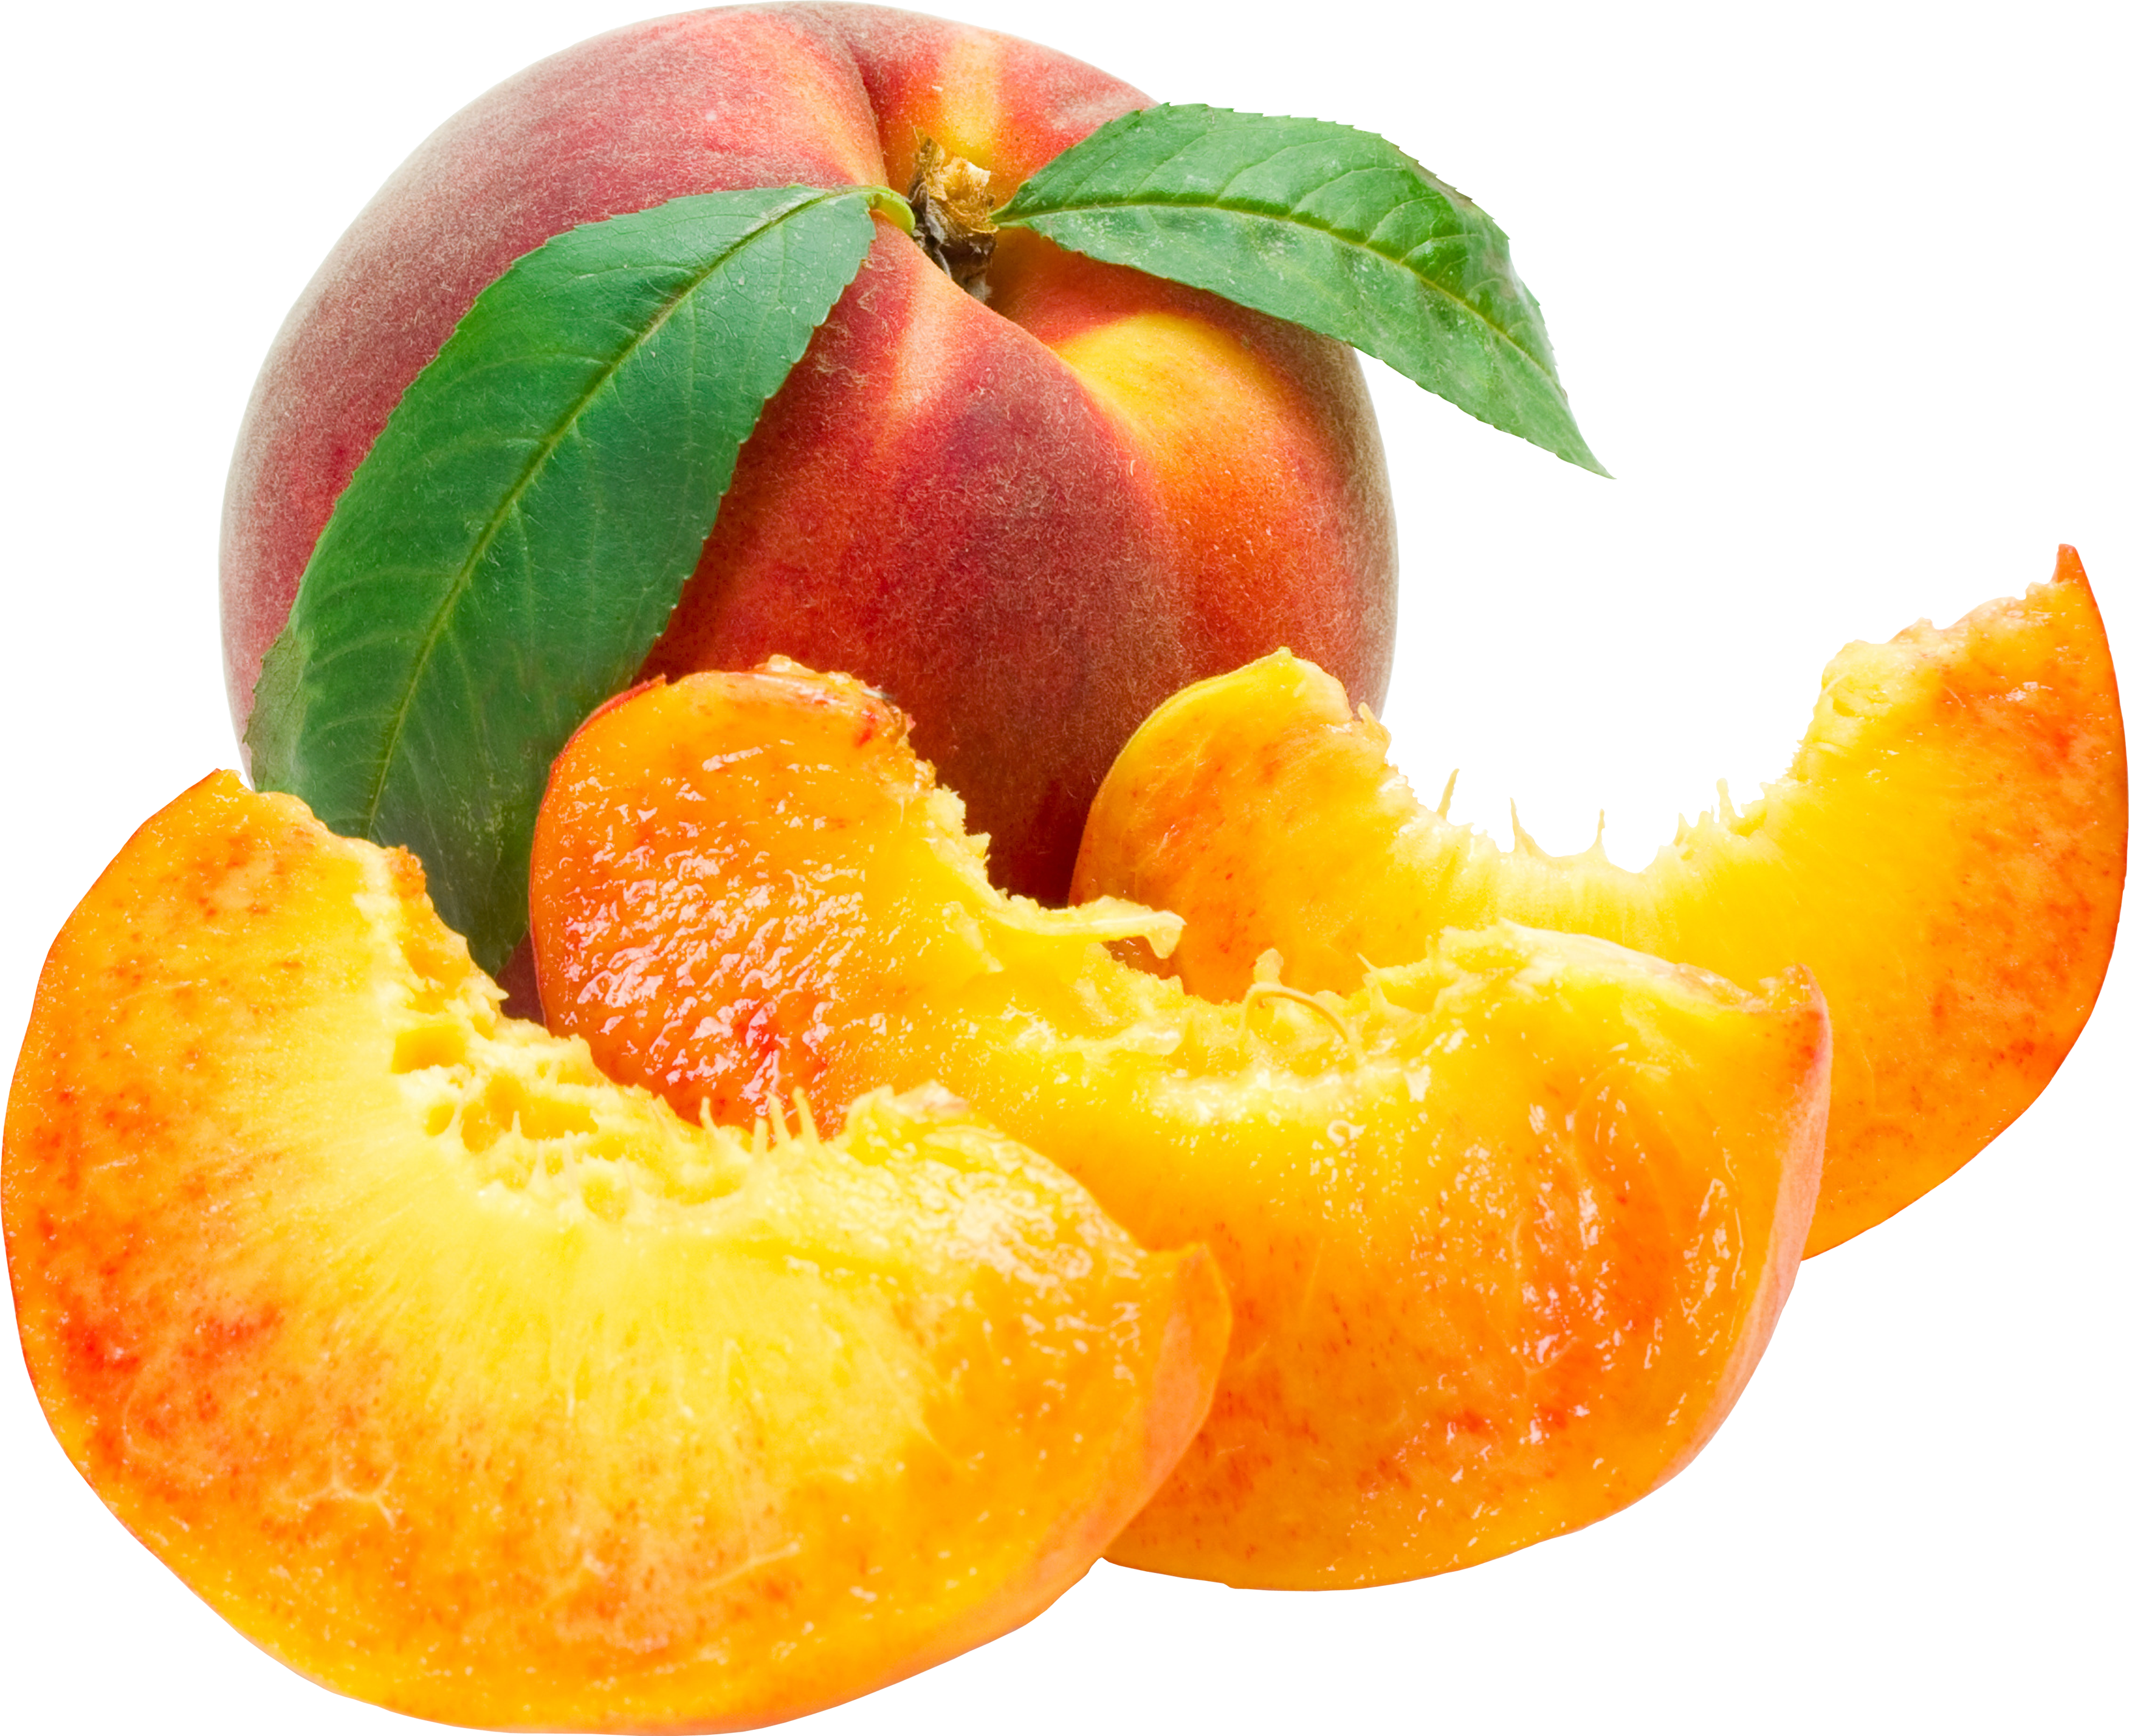 Peach Cut PNG Image